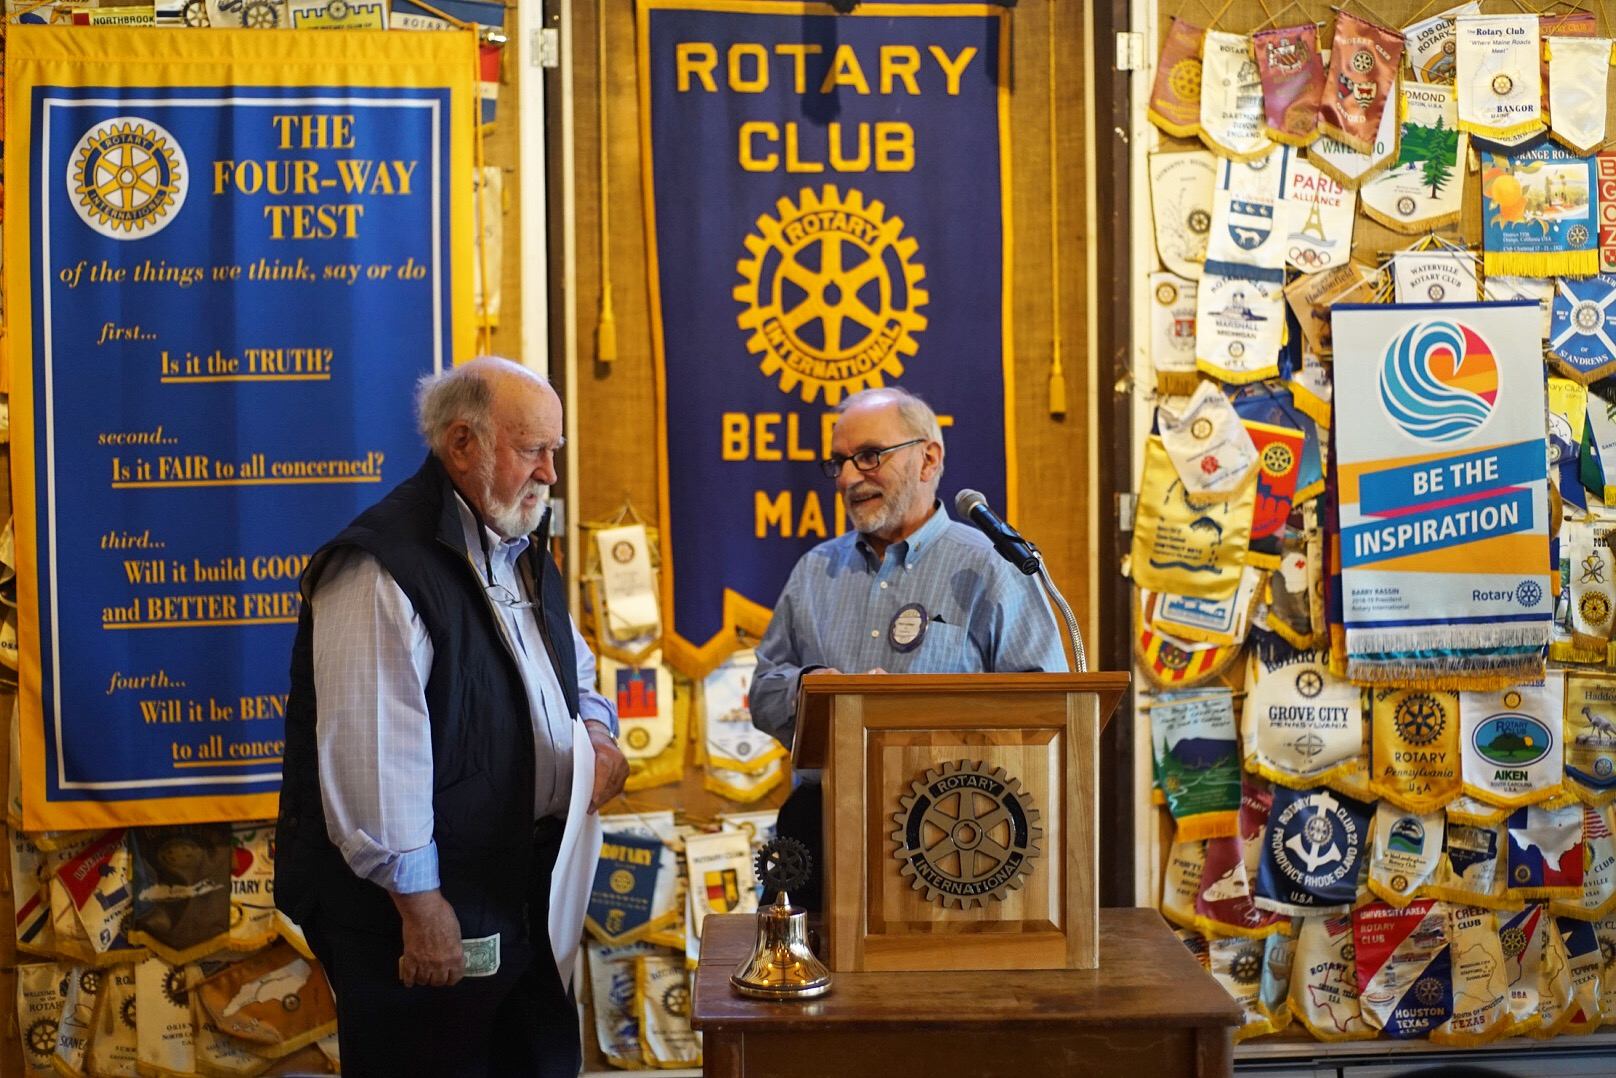 Duke and Phil at the Belfast Rotary Club meeting. Every Wednesday at the Waldo County Shrine Club. Photo: Chris Battaglia